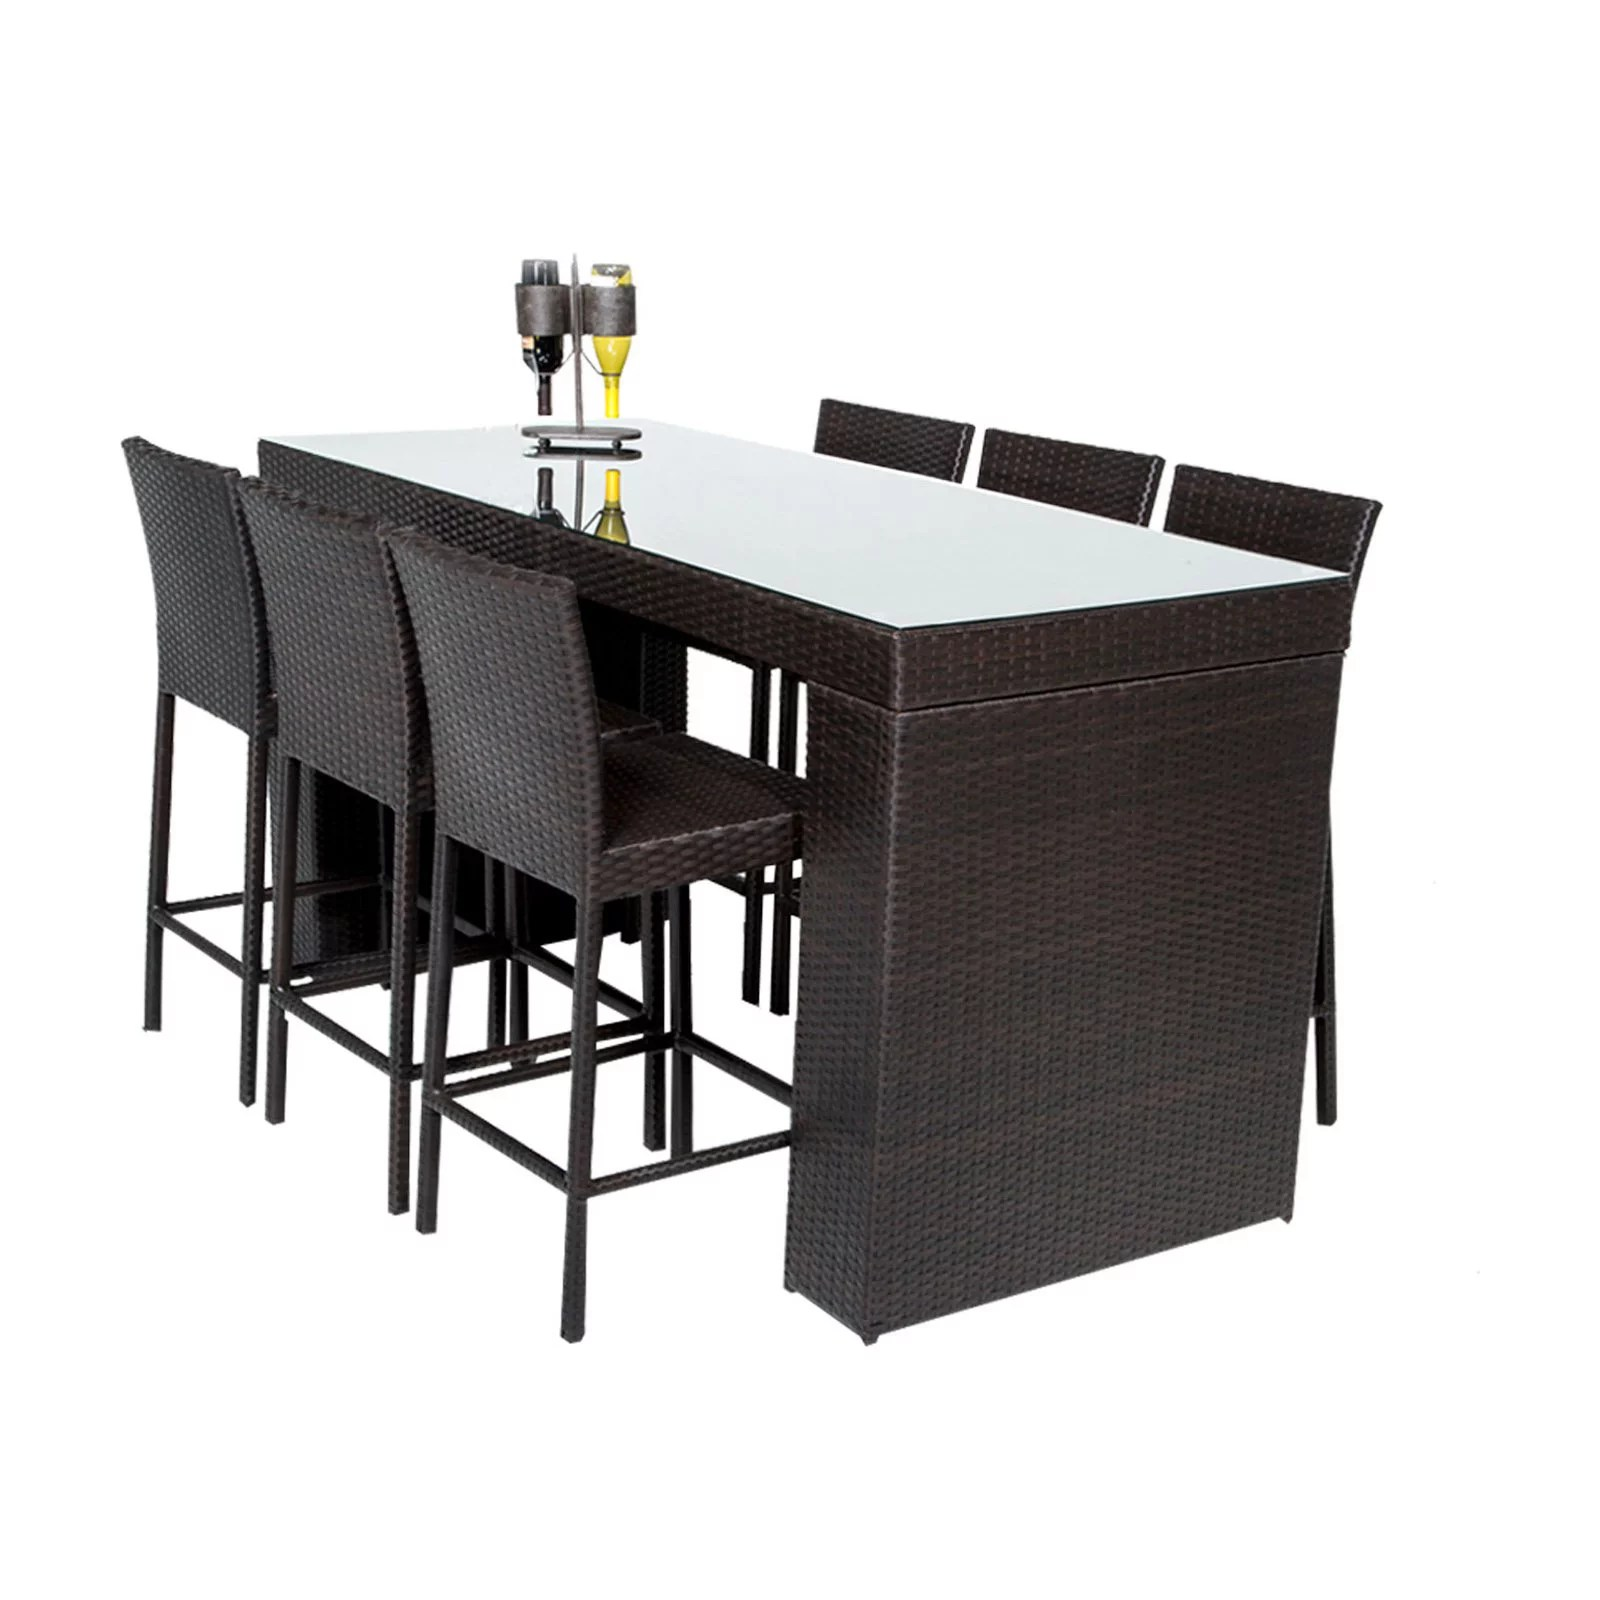 tk classics barbados 7 piece wicker bar height patio dining set